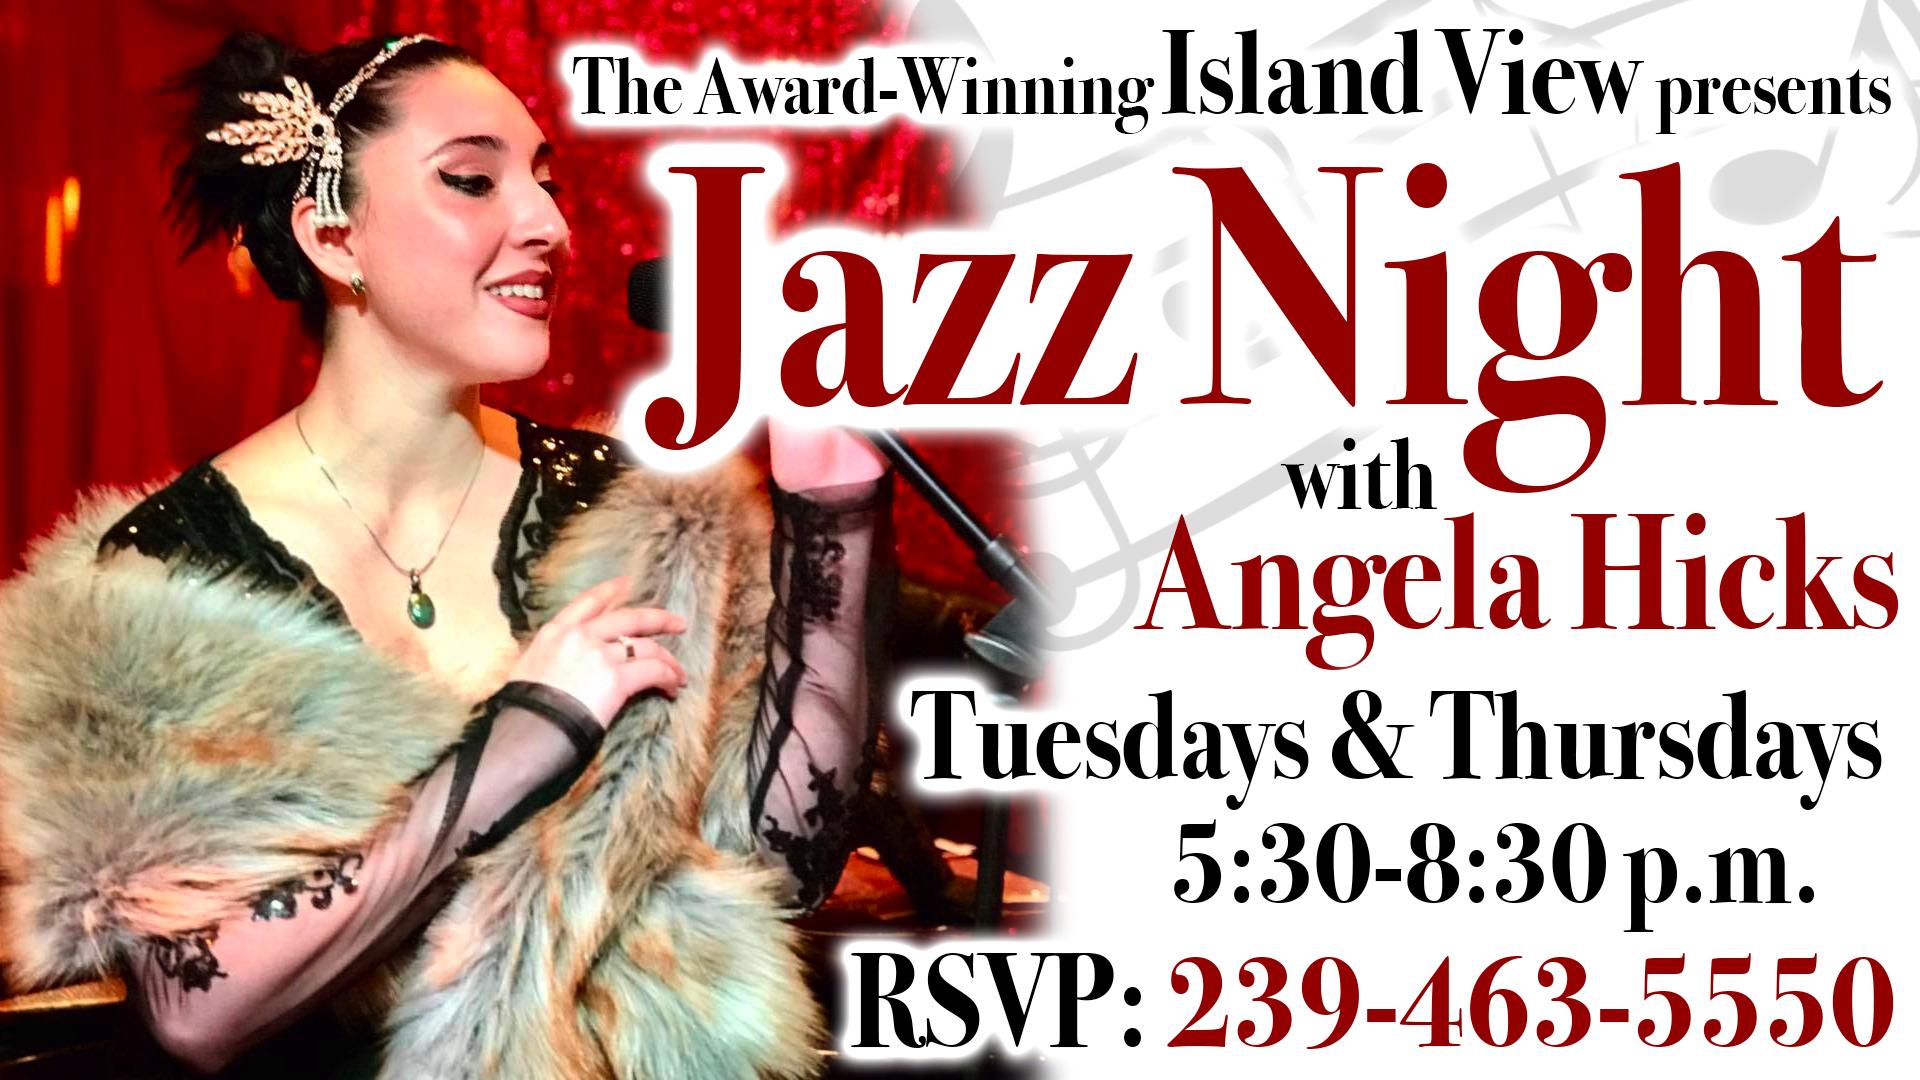 Jazz Night in the IV 1021